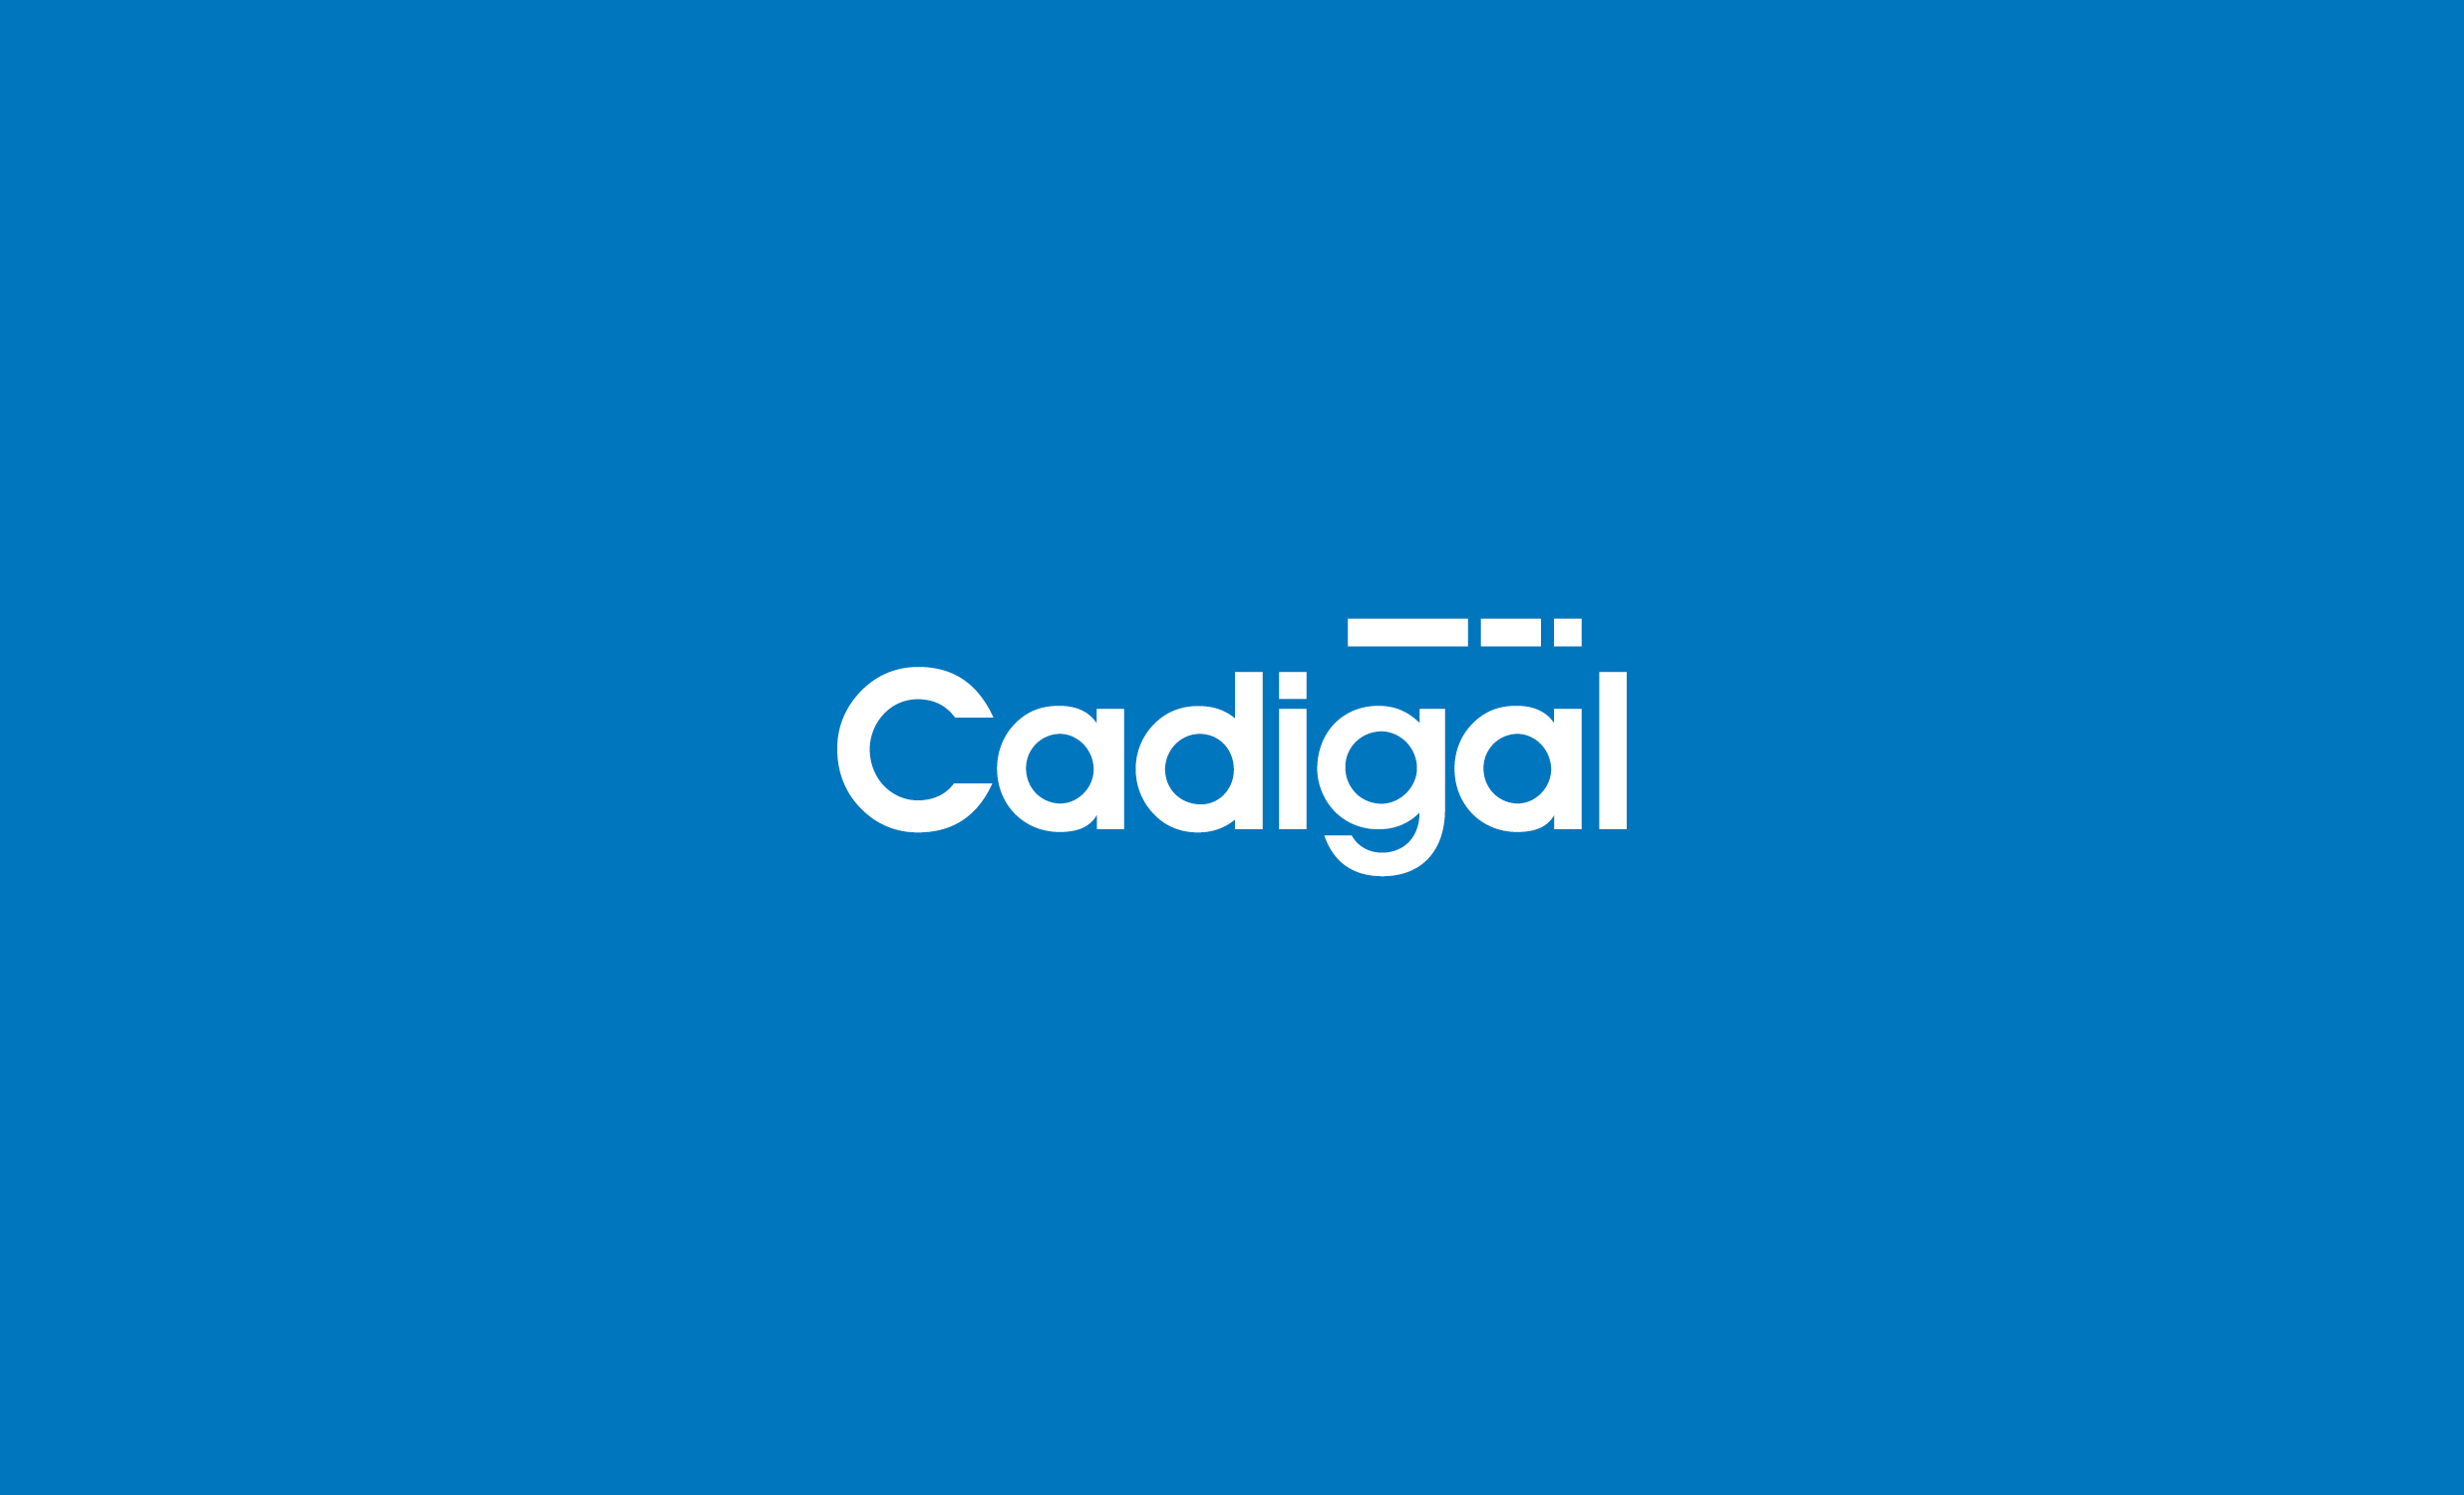 DS Cadigal 2472x1500px 2.jpg